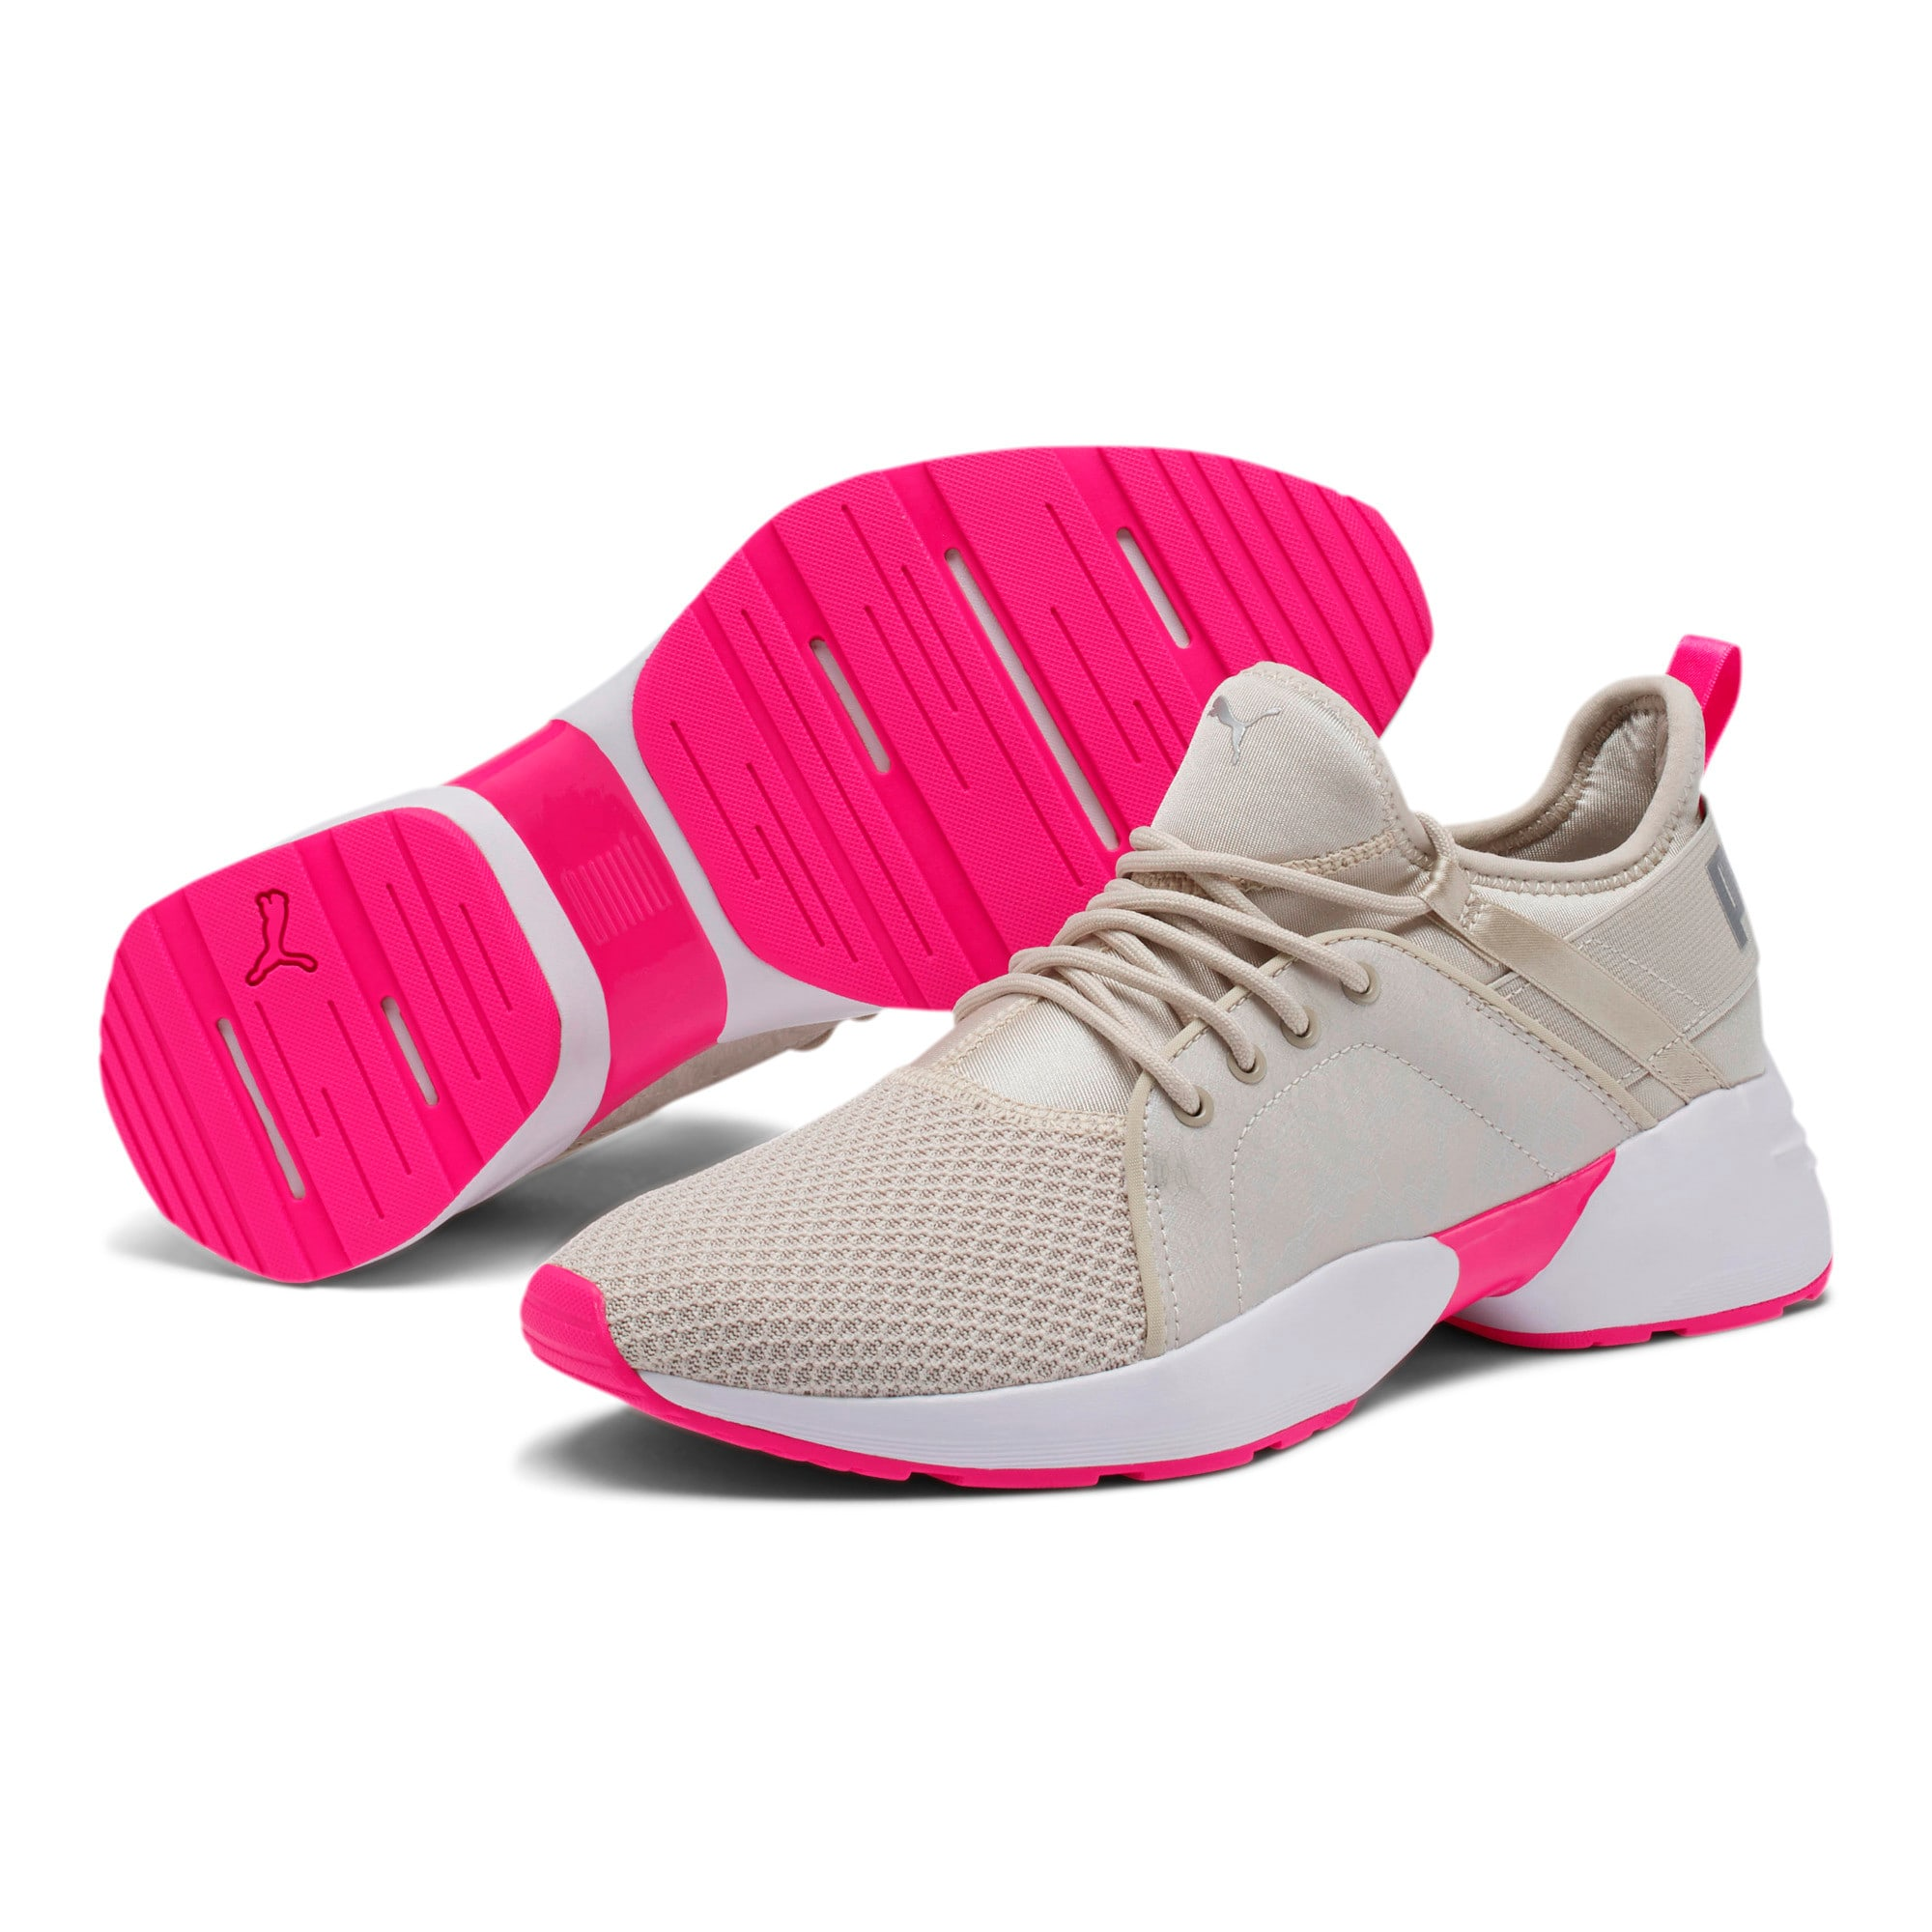 Thumbnail 2 of Sirena Summer Women's Sneakers, Silver Gray-Puma White, medium